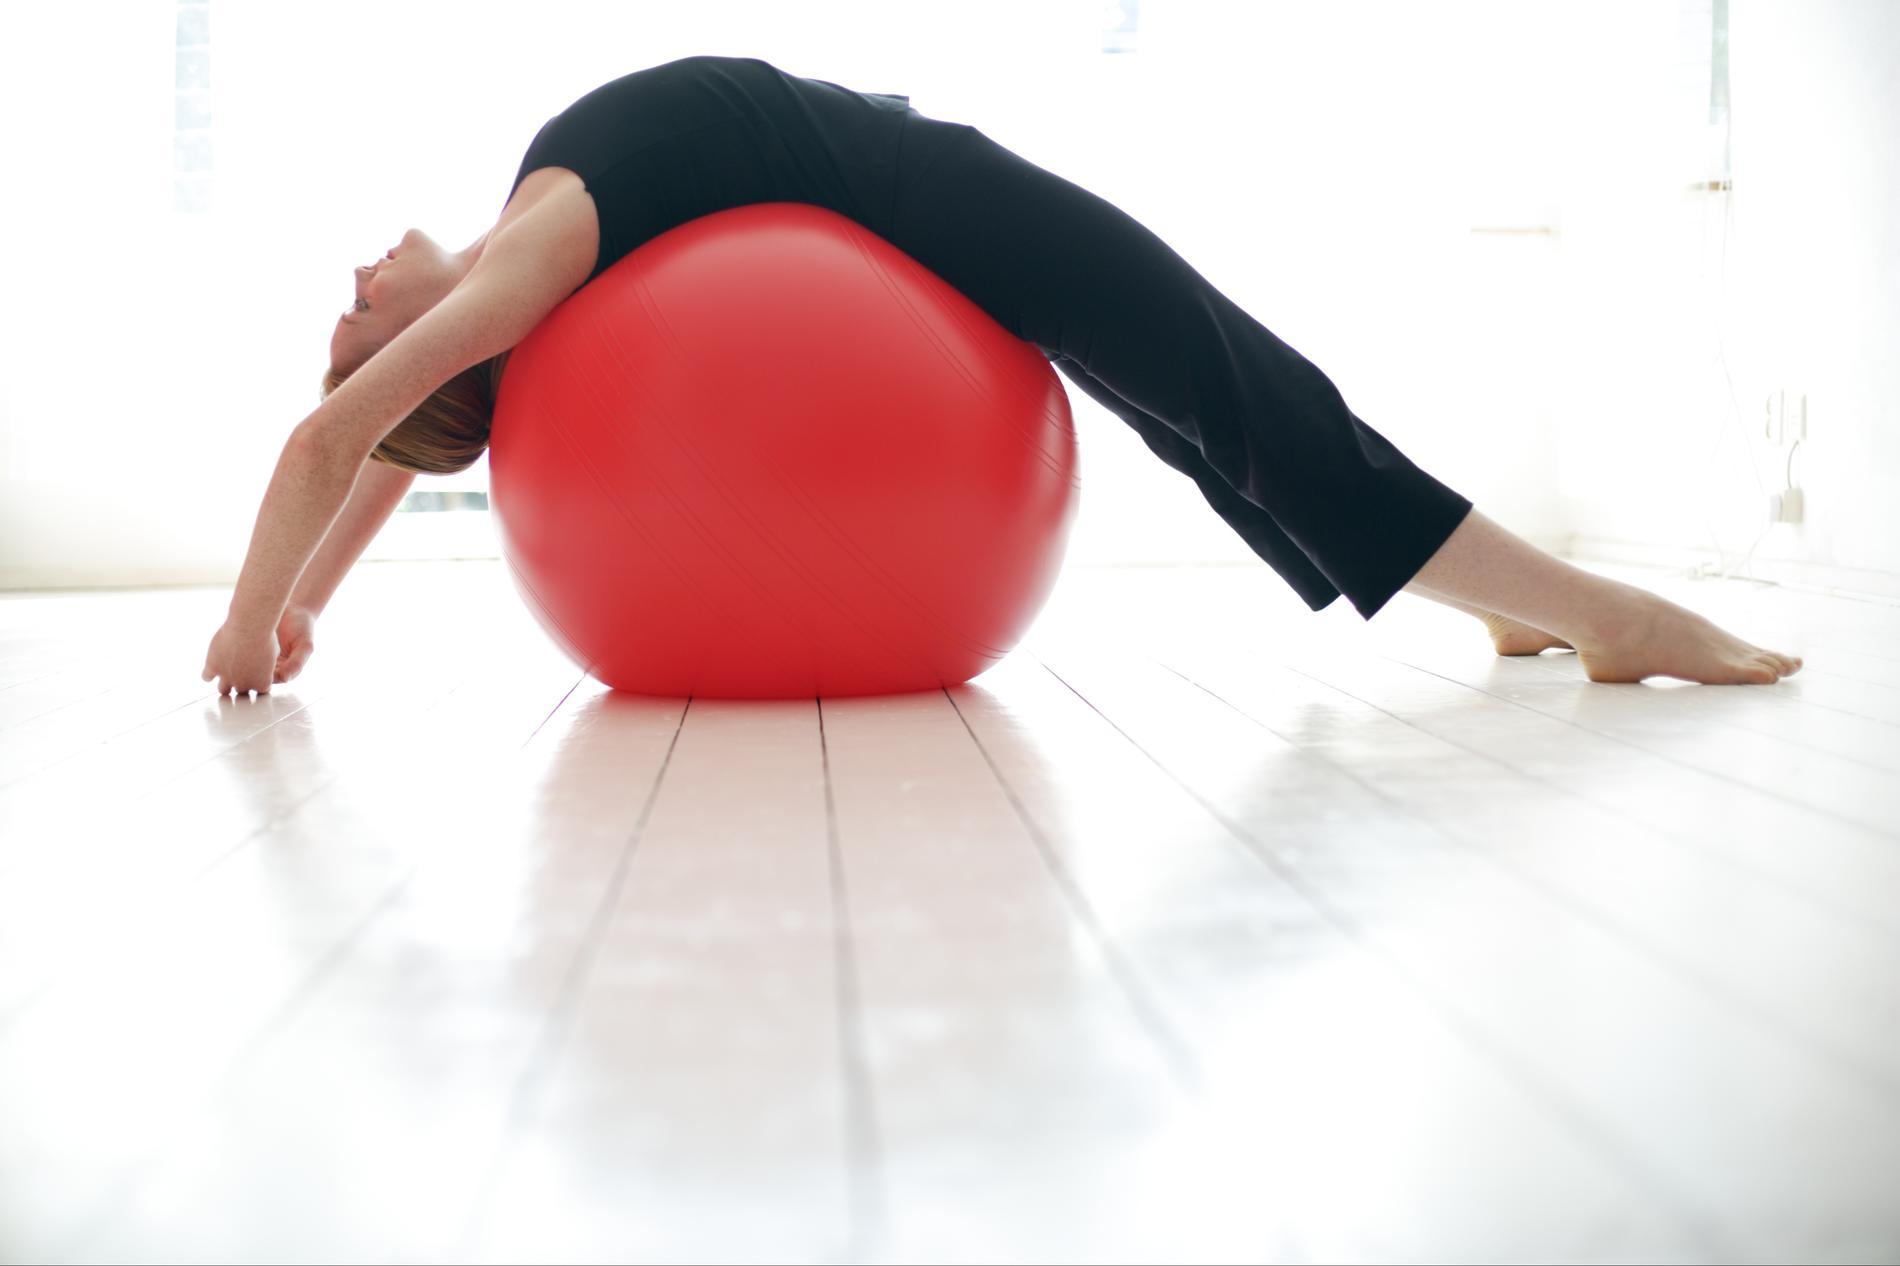 abdos bras fessiers 7 exercices faire avec un ballon de. Black Bedroom Furniture Sets. Home Design Ideas